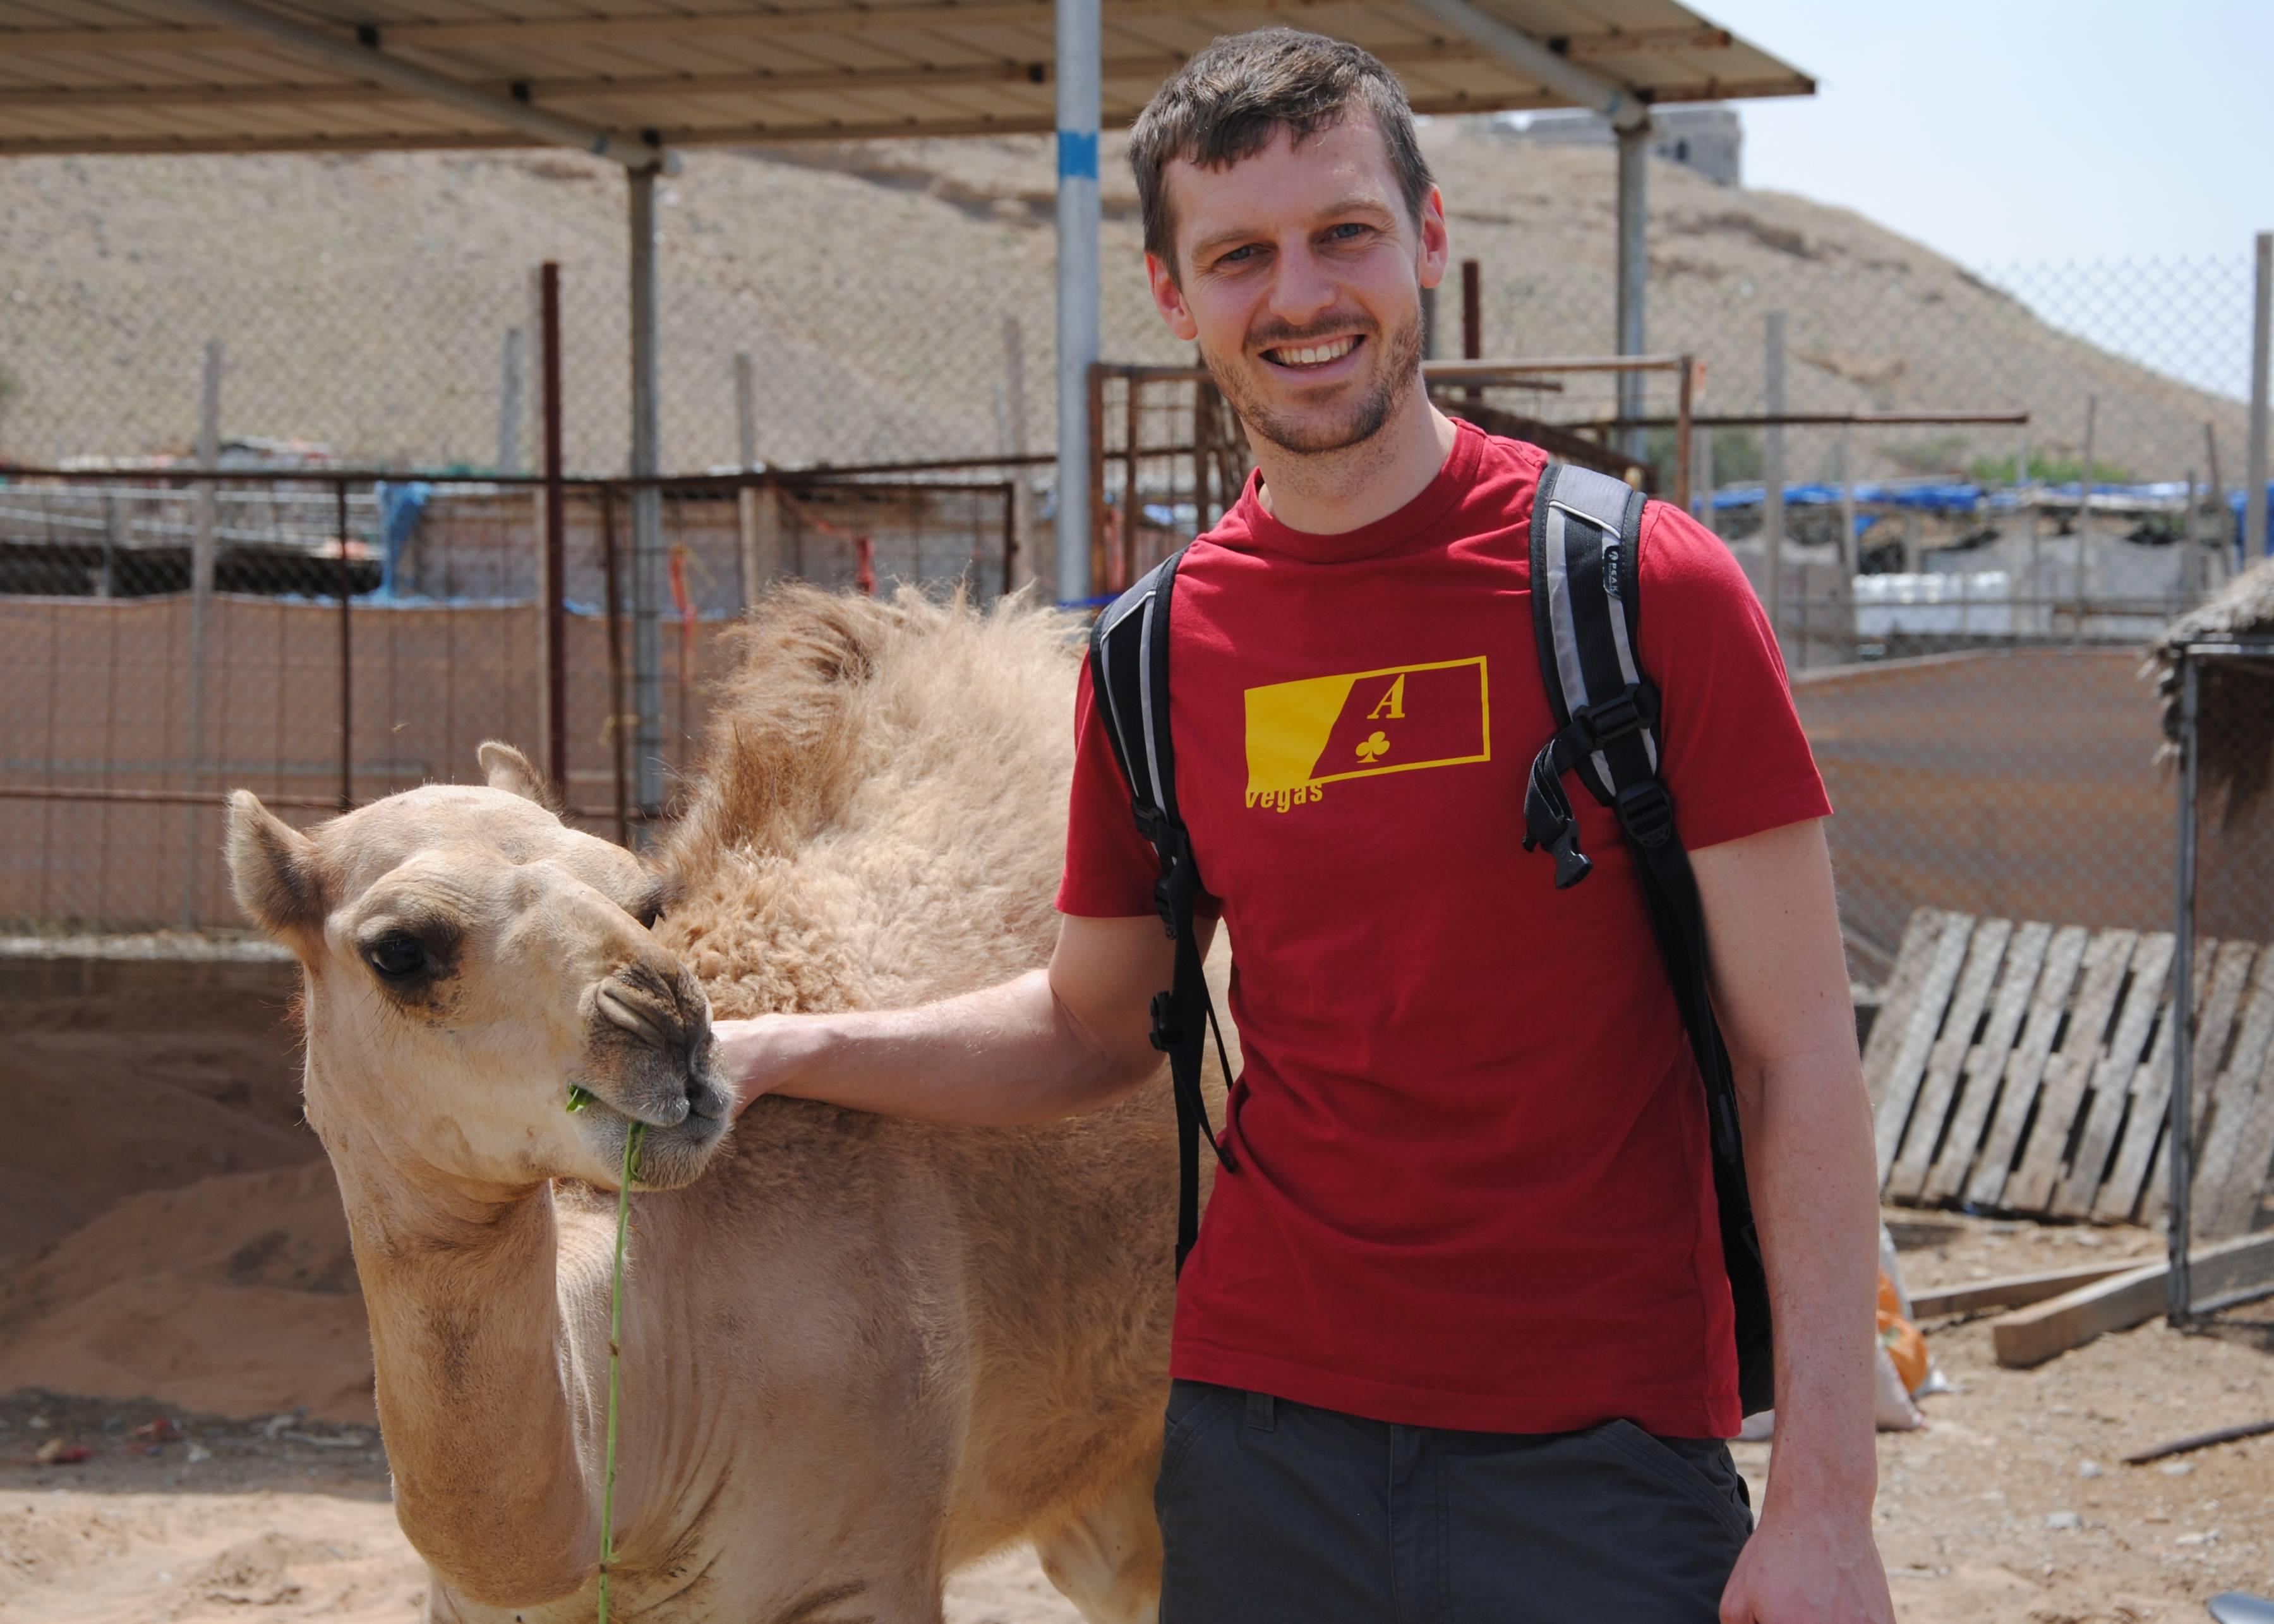 Sebastian neben einem jungen Kamel